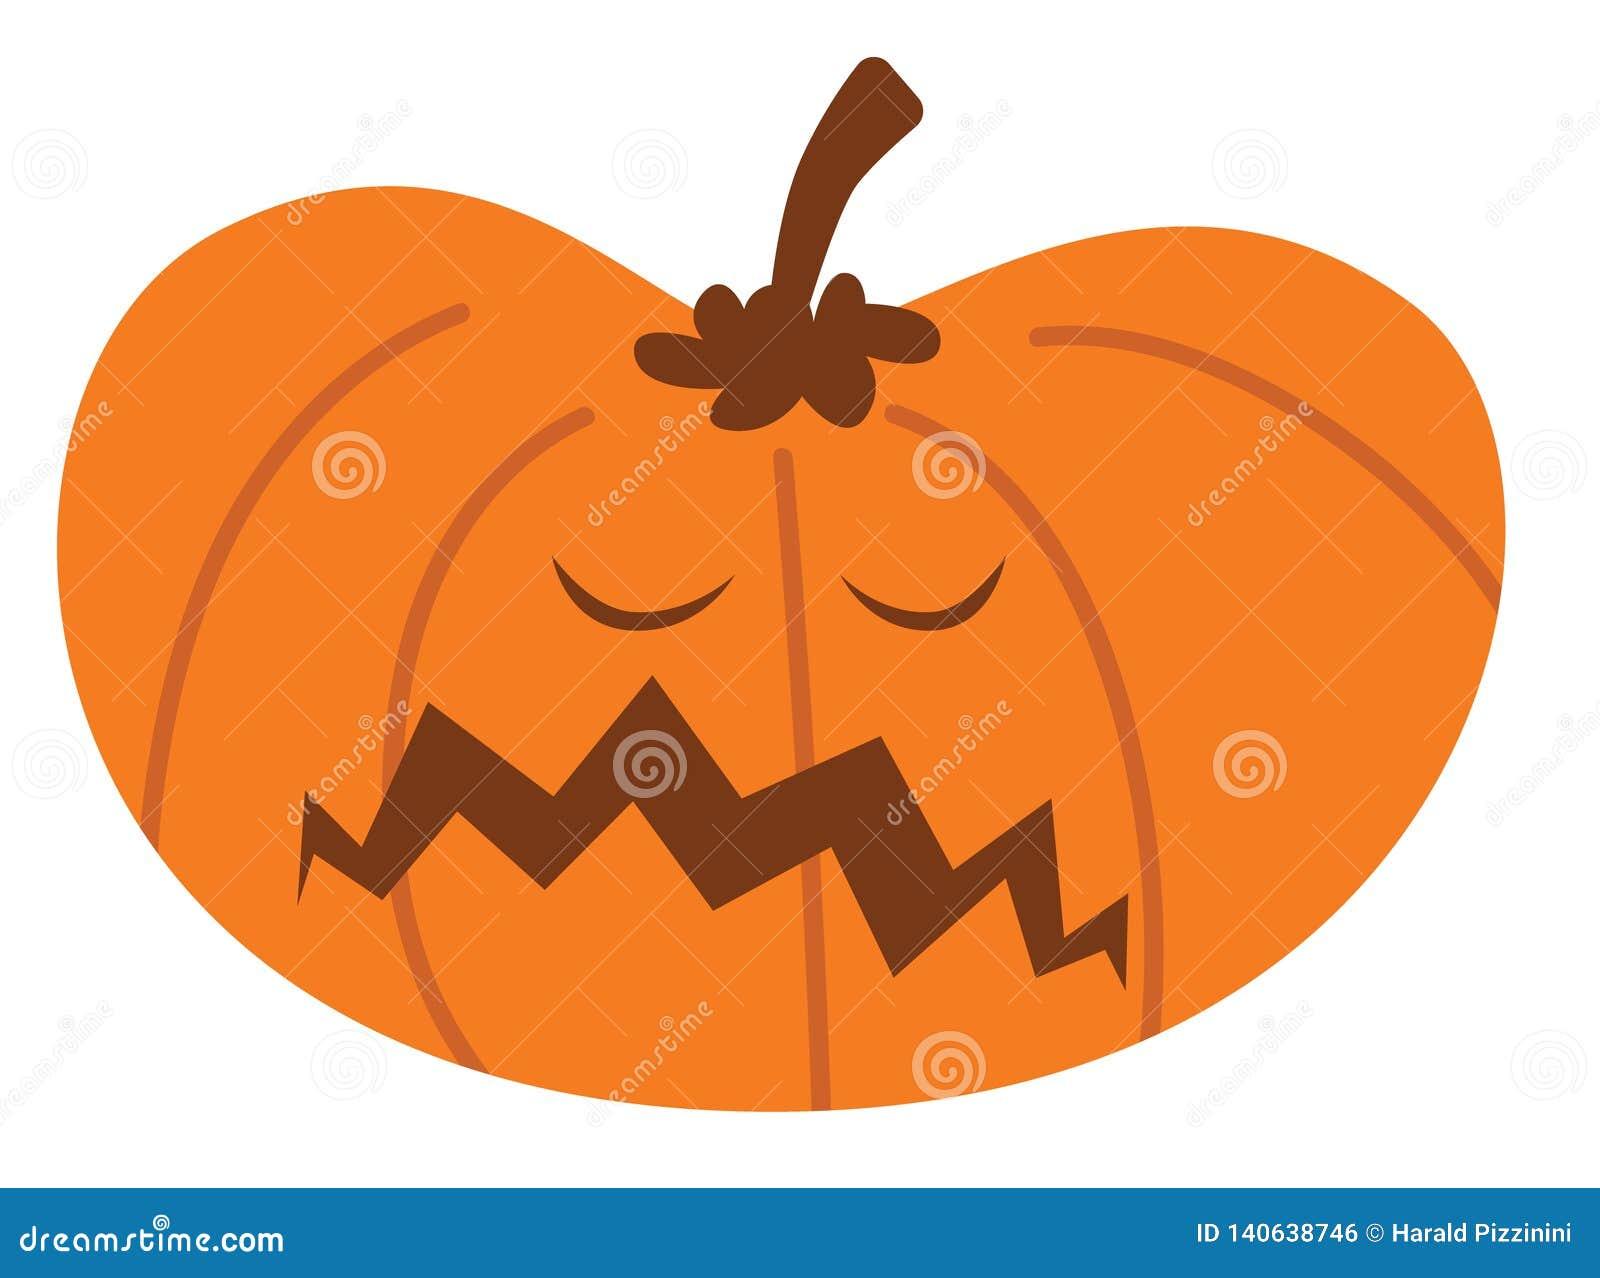 Cartoon halloween pumpkin with unhappy expression